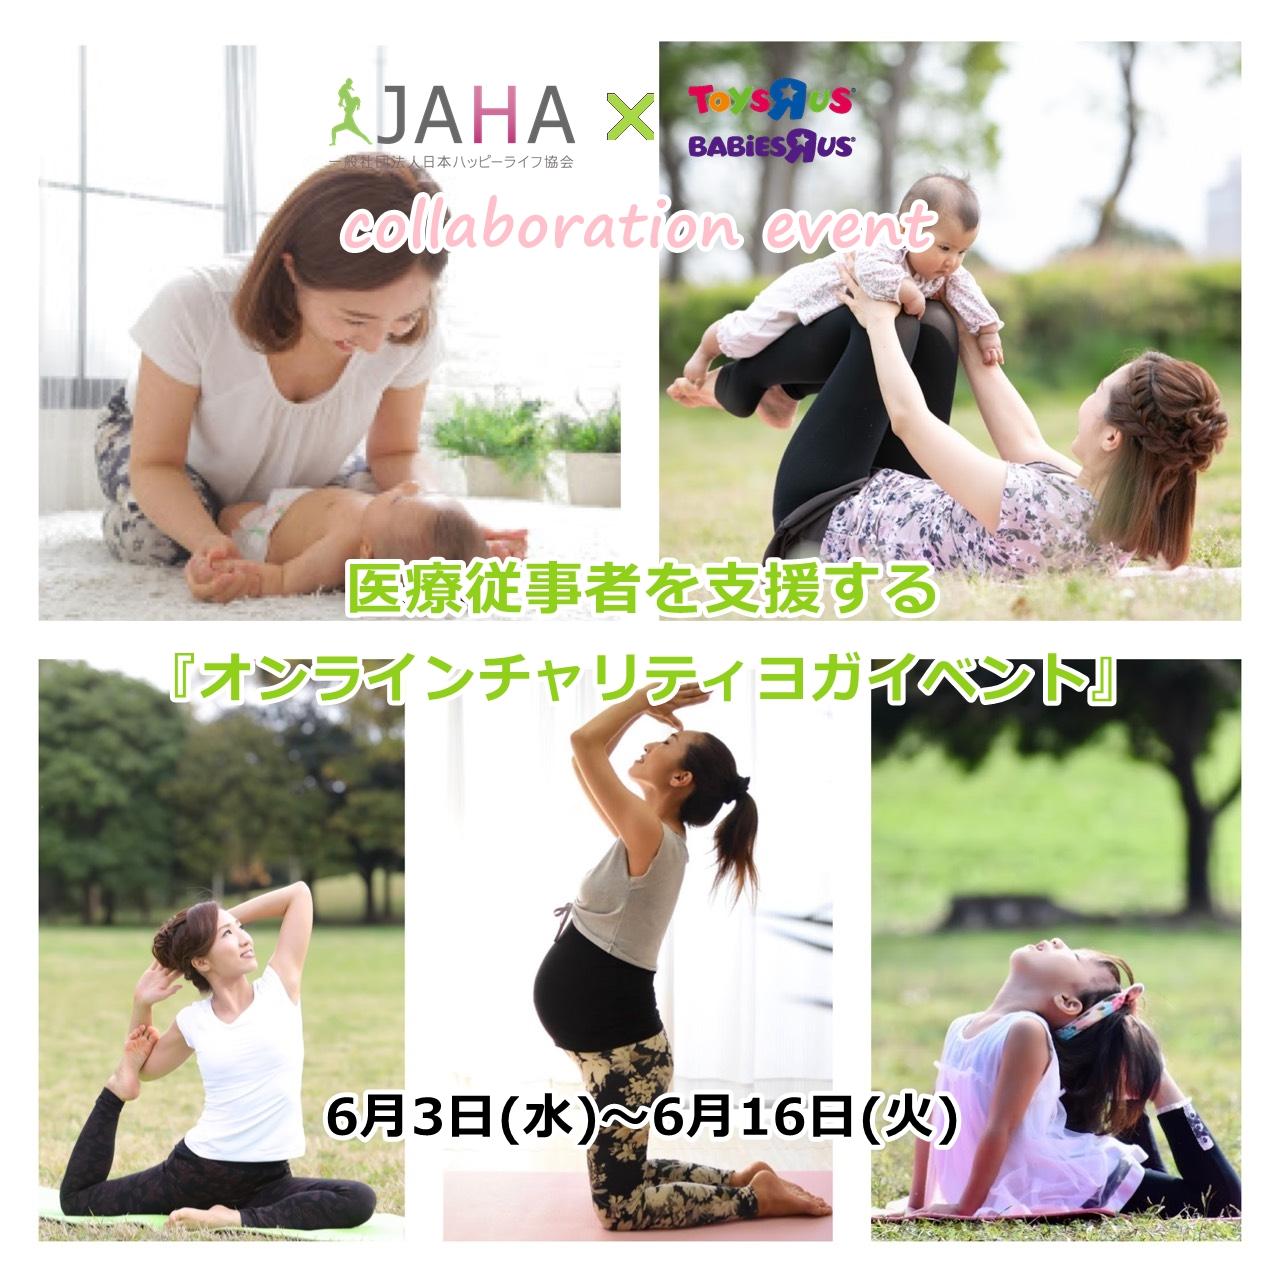 JAHA協会と日本トイザらス、医療従事者を支援する 『…の画像